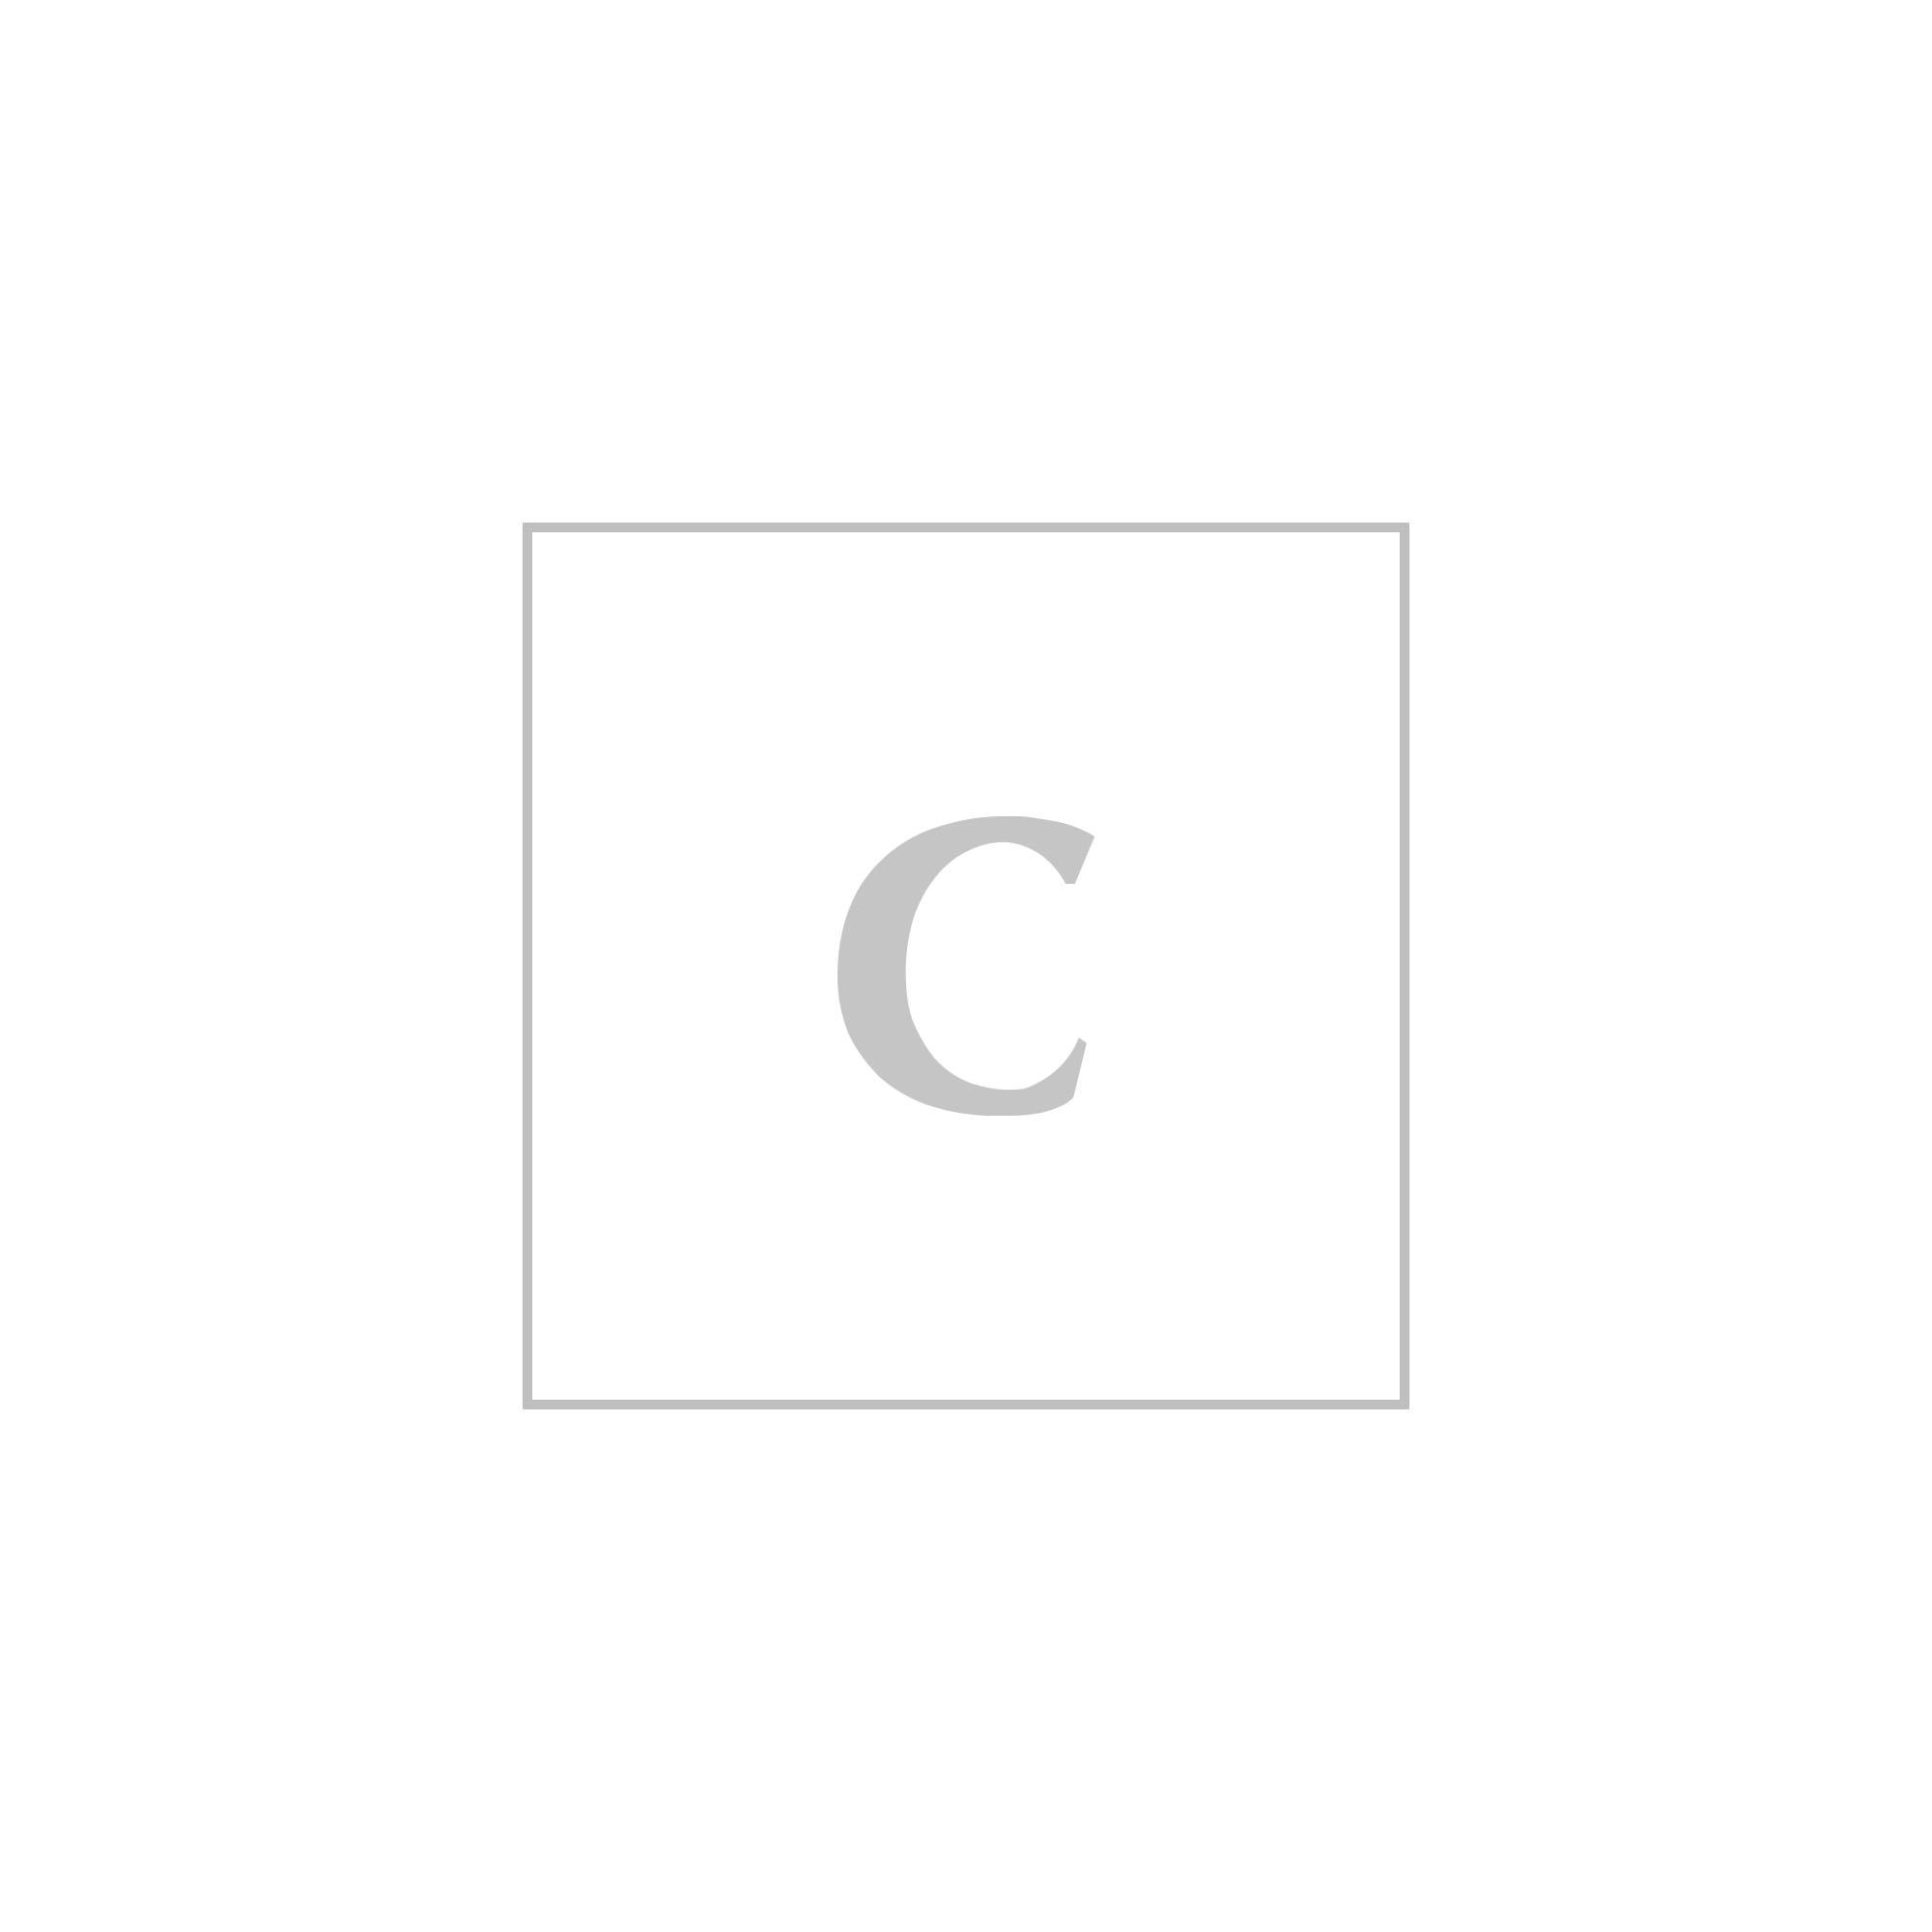 Dolce & gabbana semi-padded balconette bra